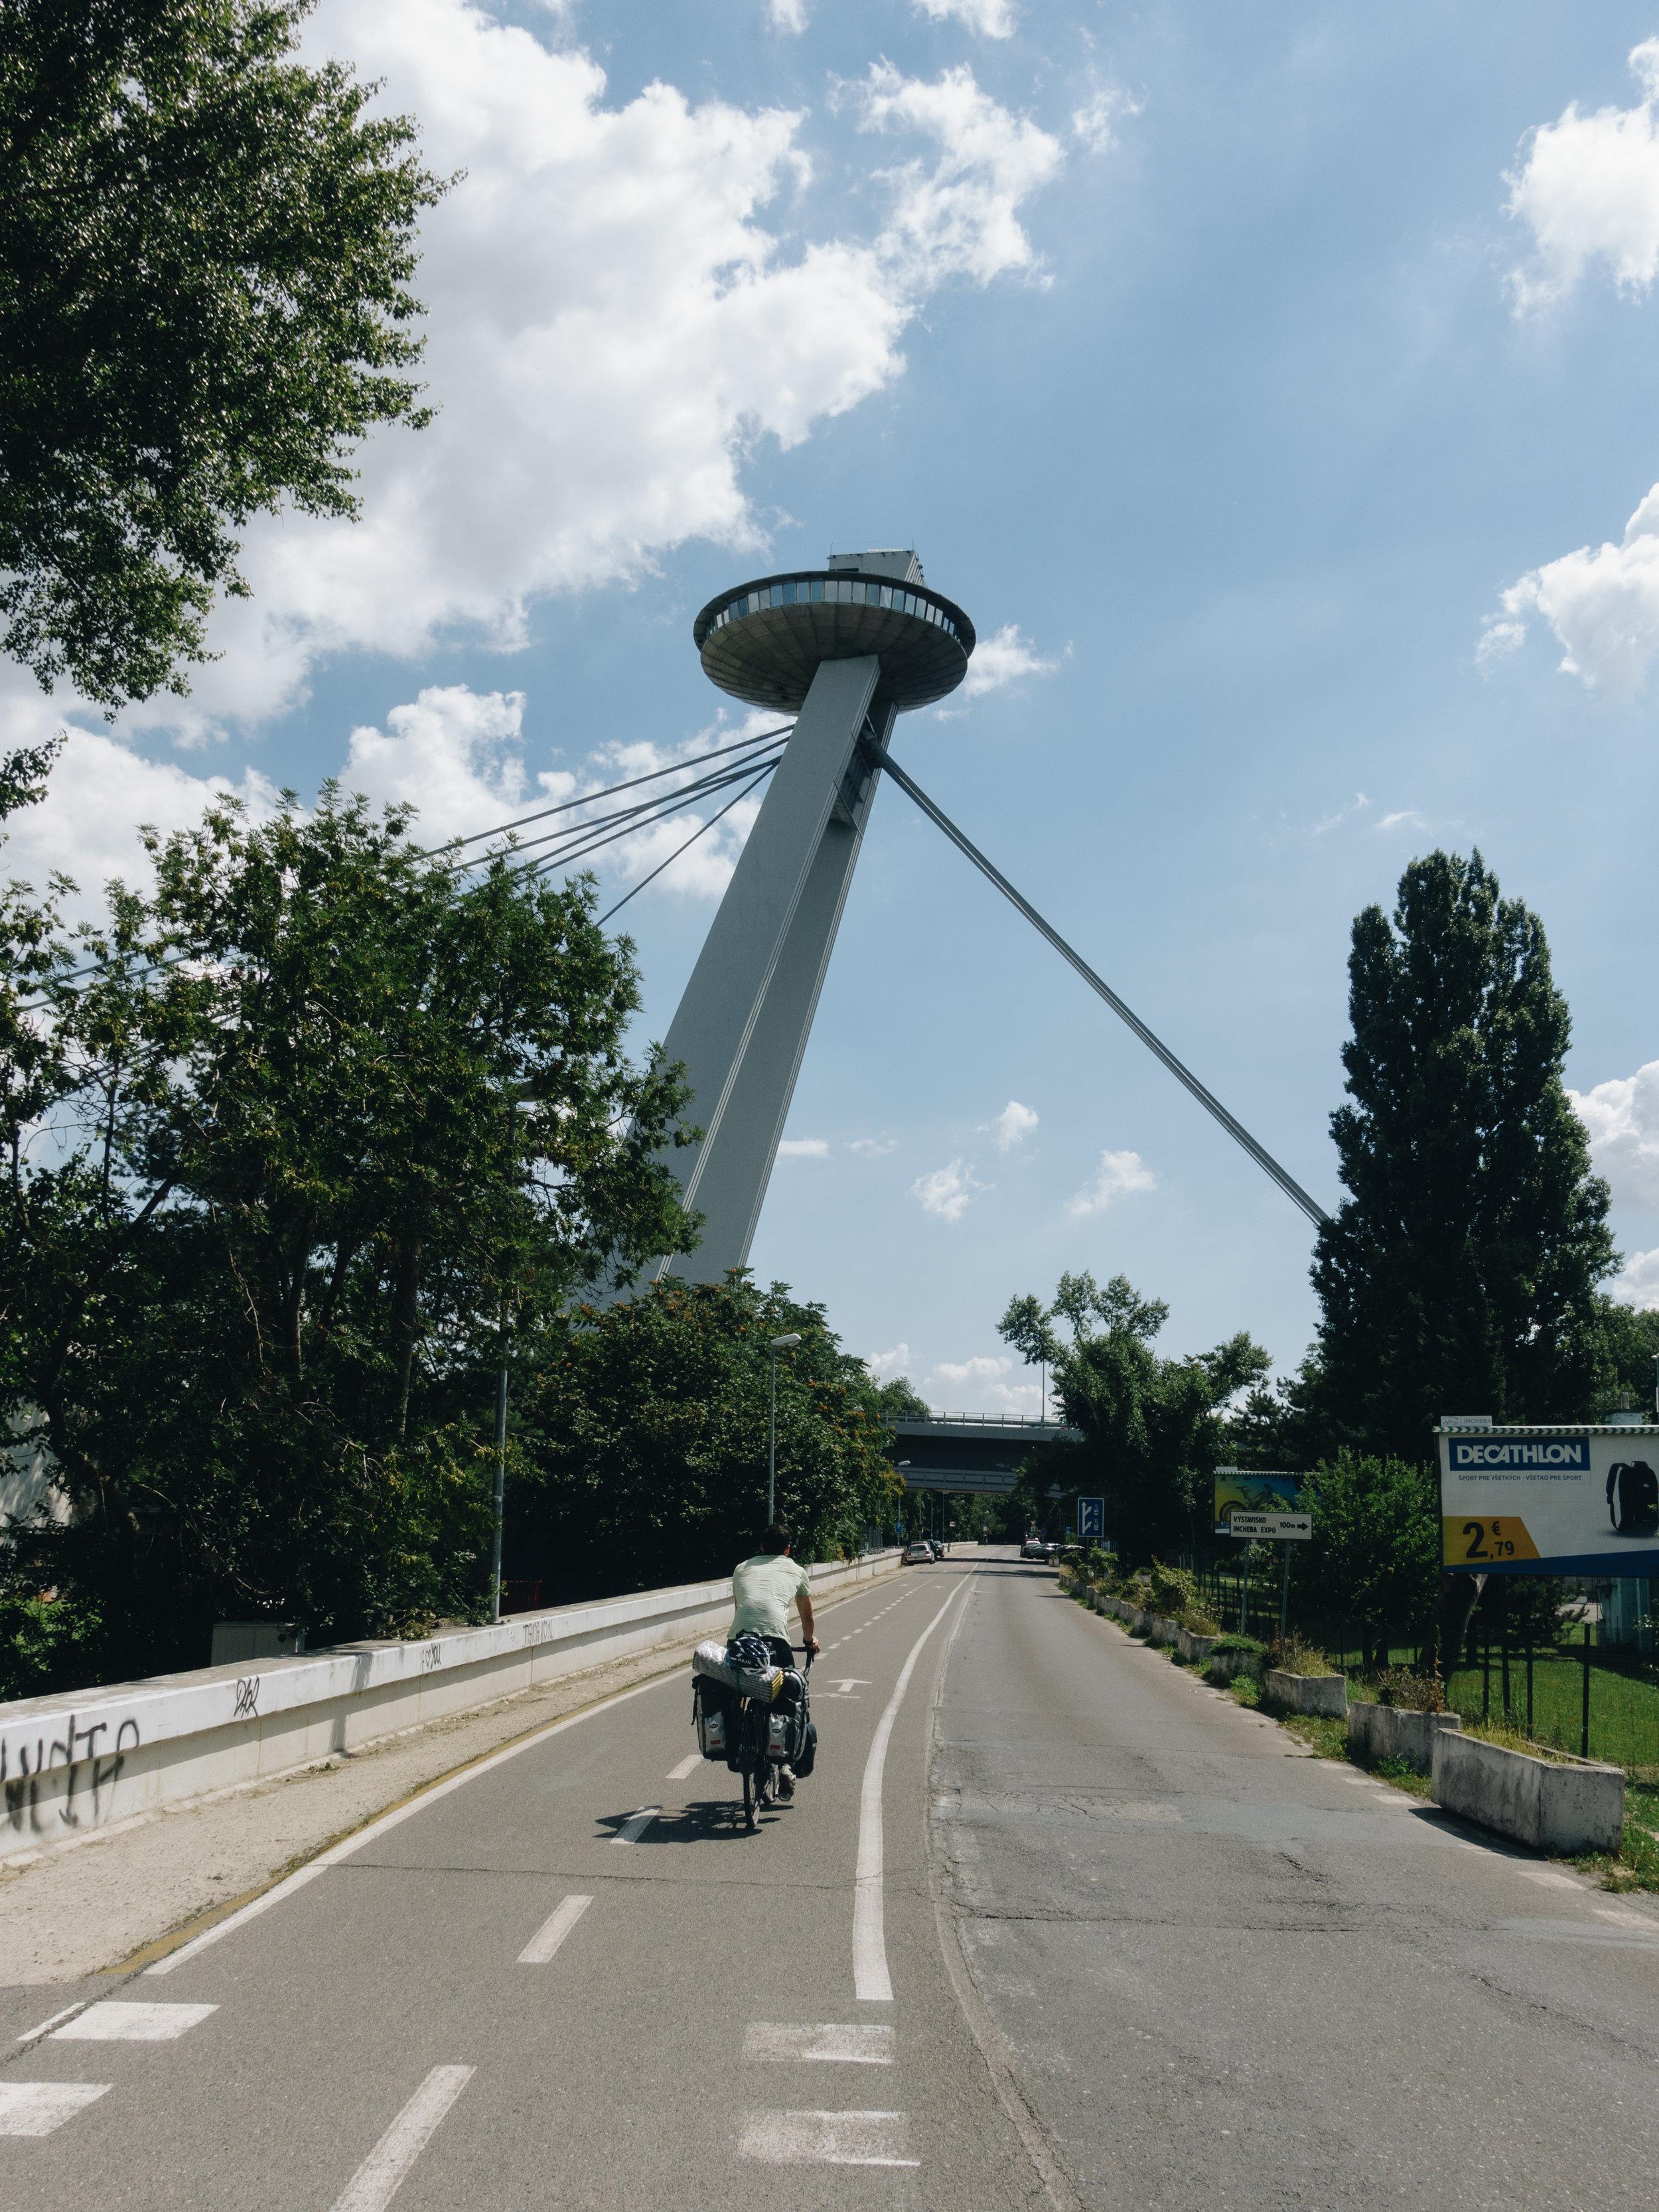 The recognisable Novy most (UFO) bridge in Bratislava, Slovakia